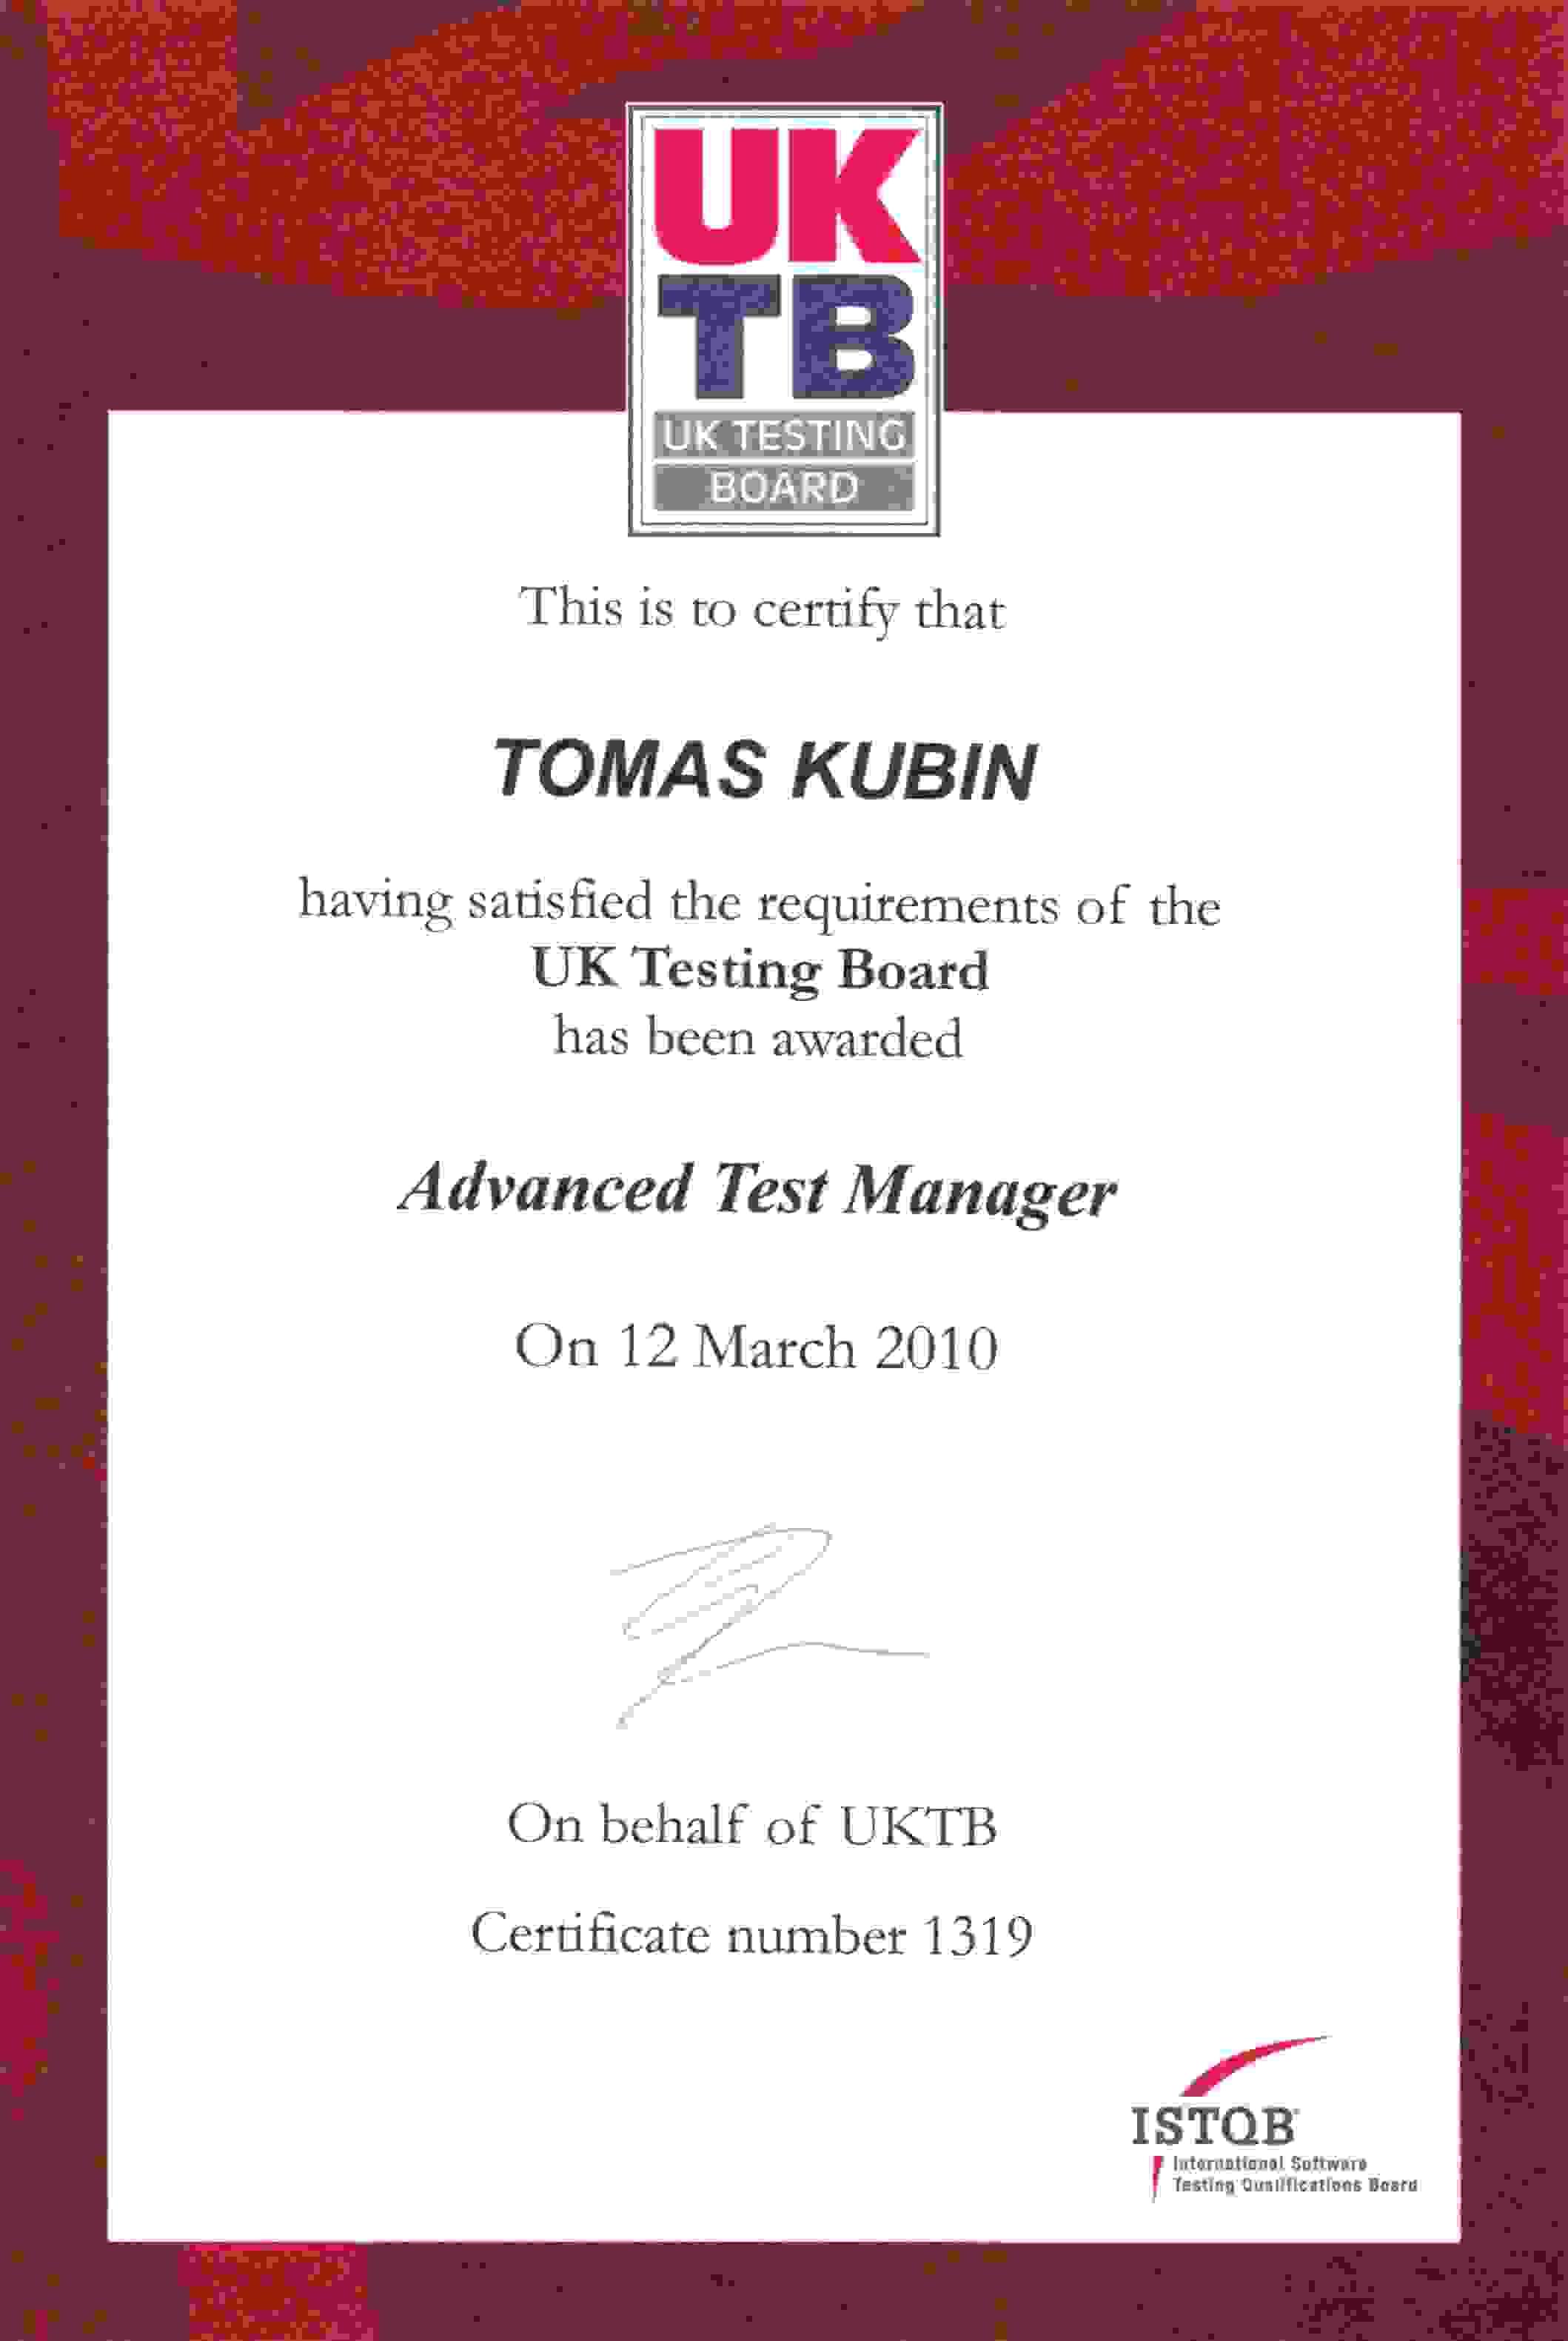 Tomas kubin personal website of tomas kubin advanced test manager istqb uktb 1319 xflitez Images